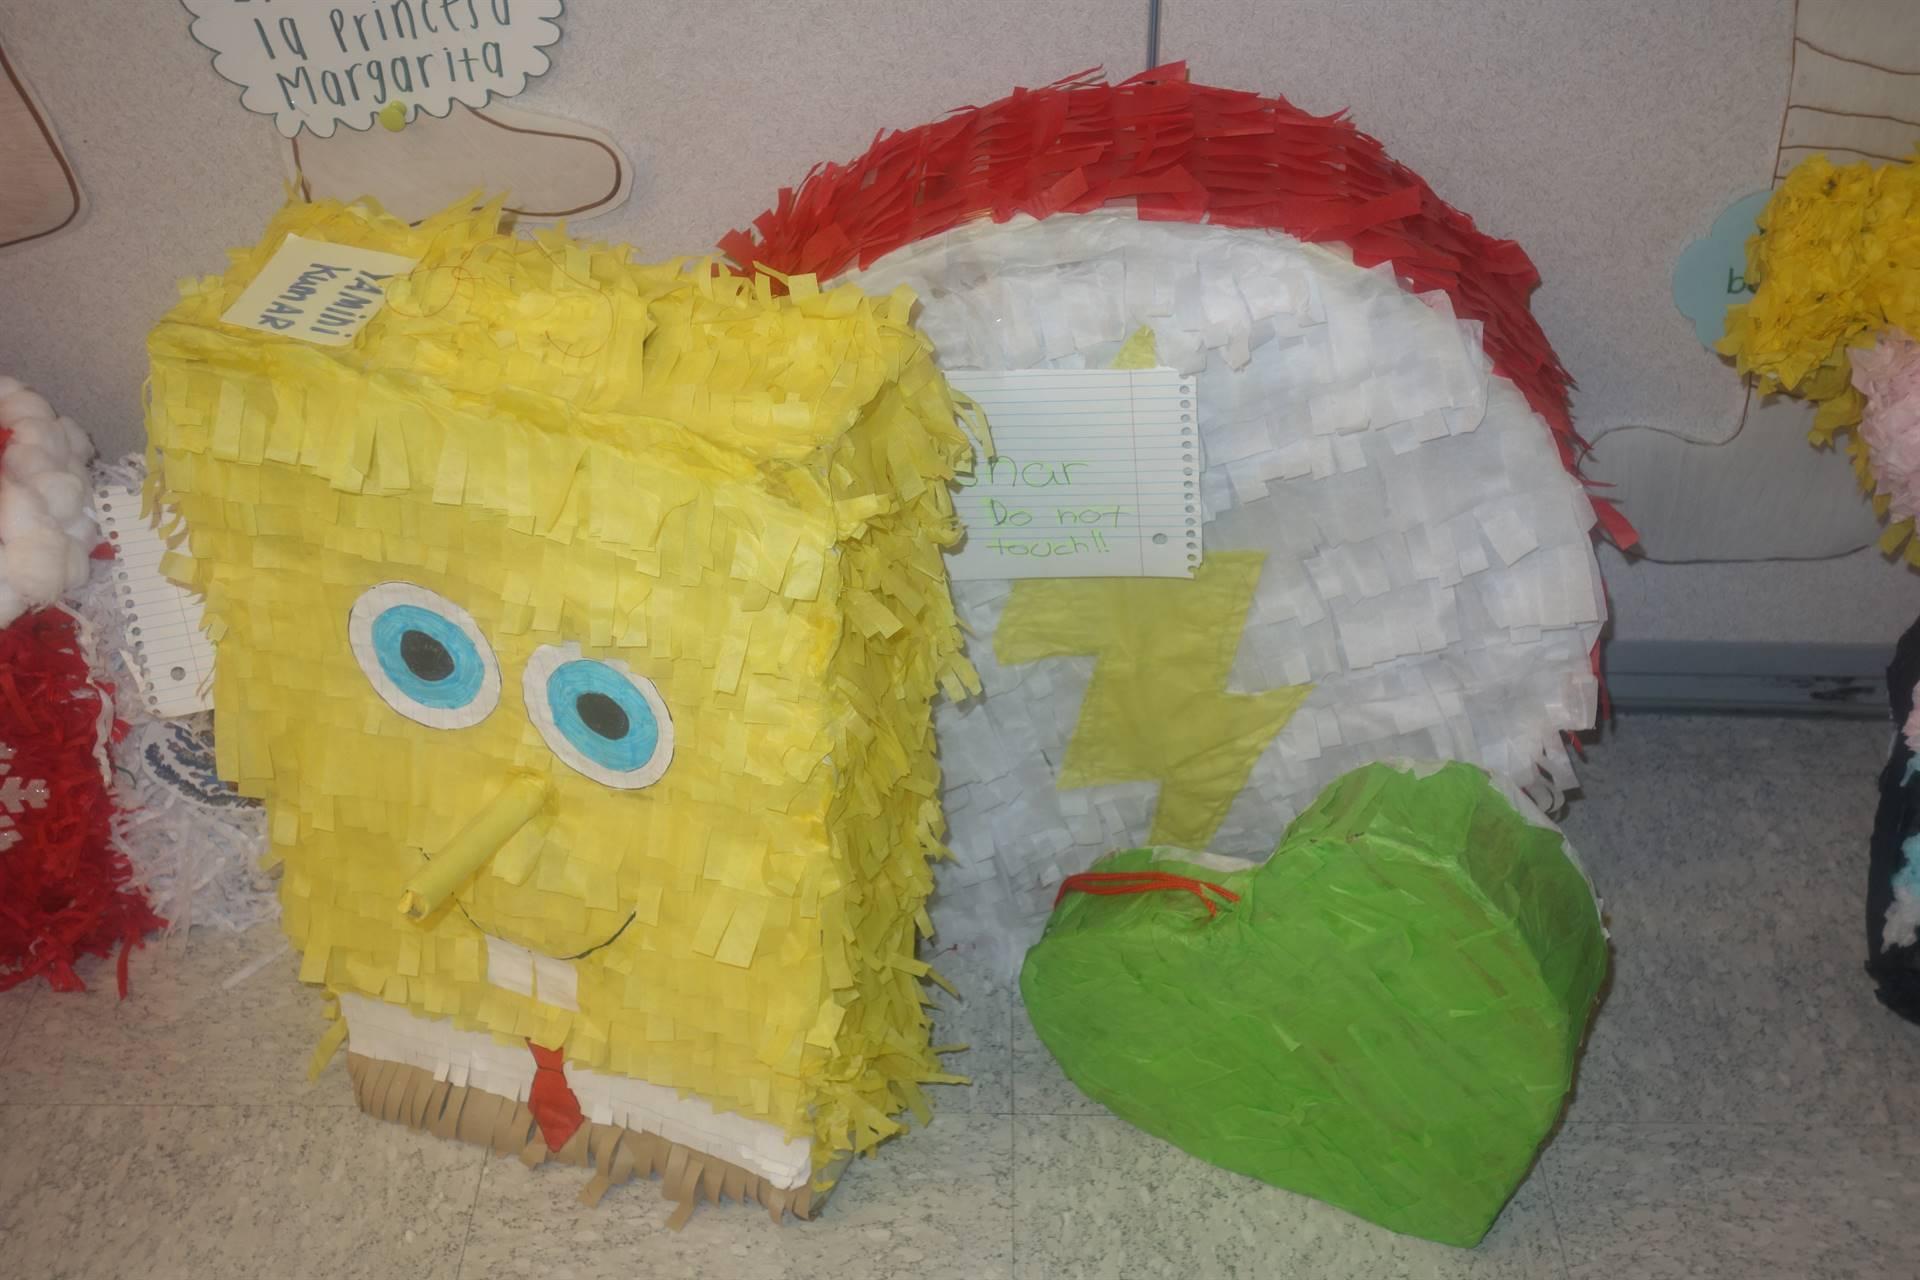 Spongebob and heart pinatas